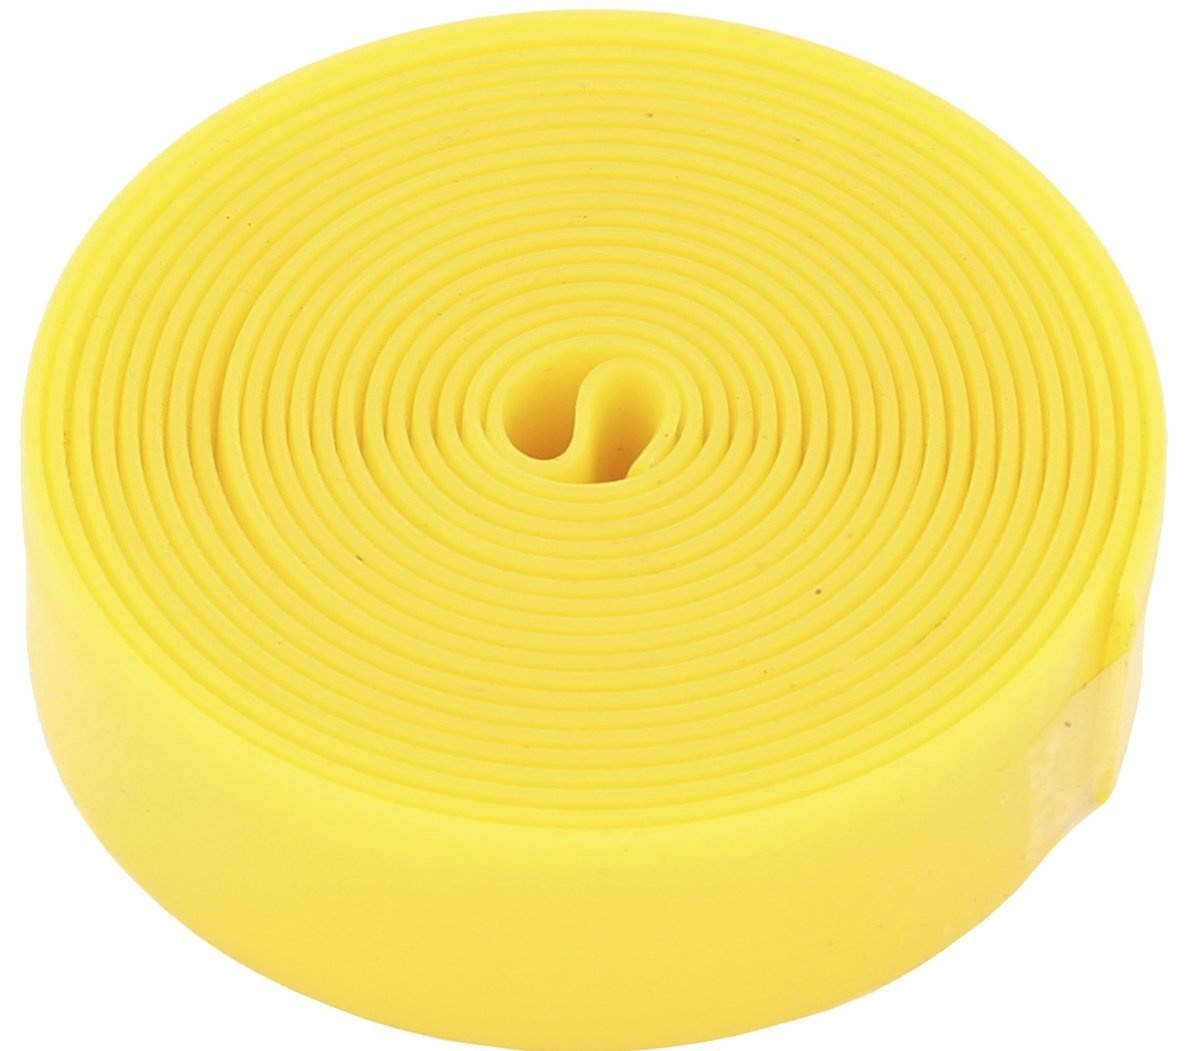 Con-Tec Puncture Protection dækindlæg - Gul 19/23c (Inklusiv Montering)